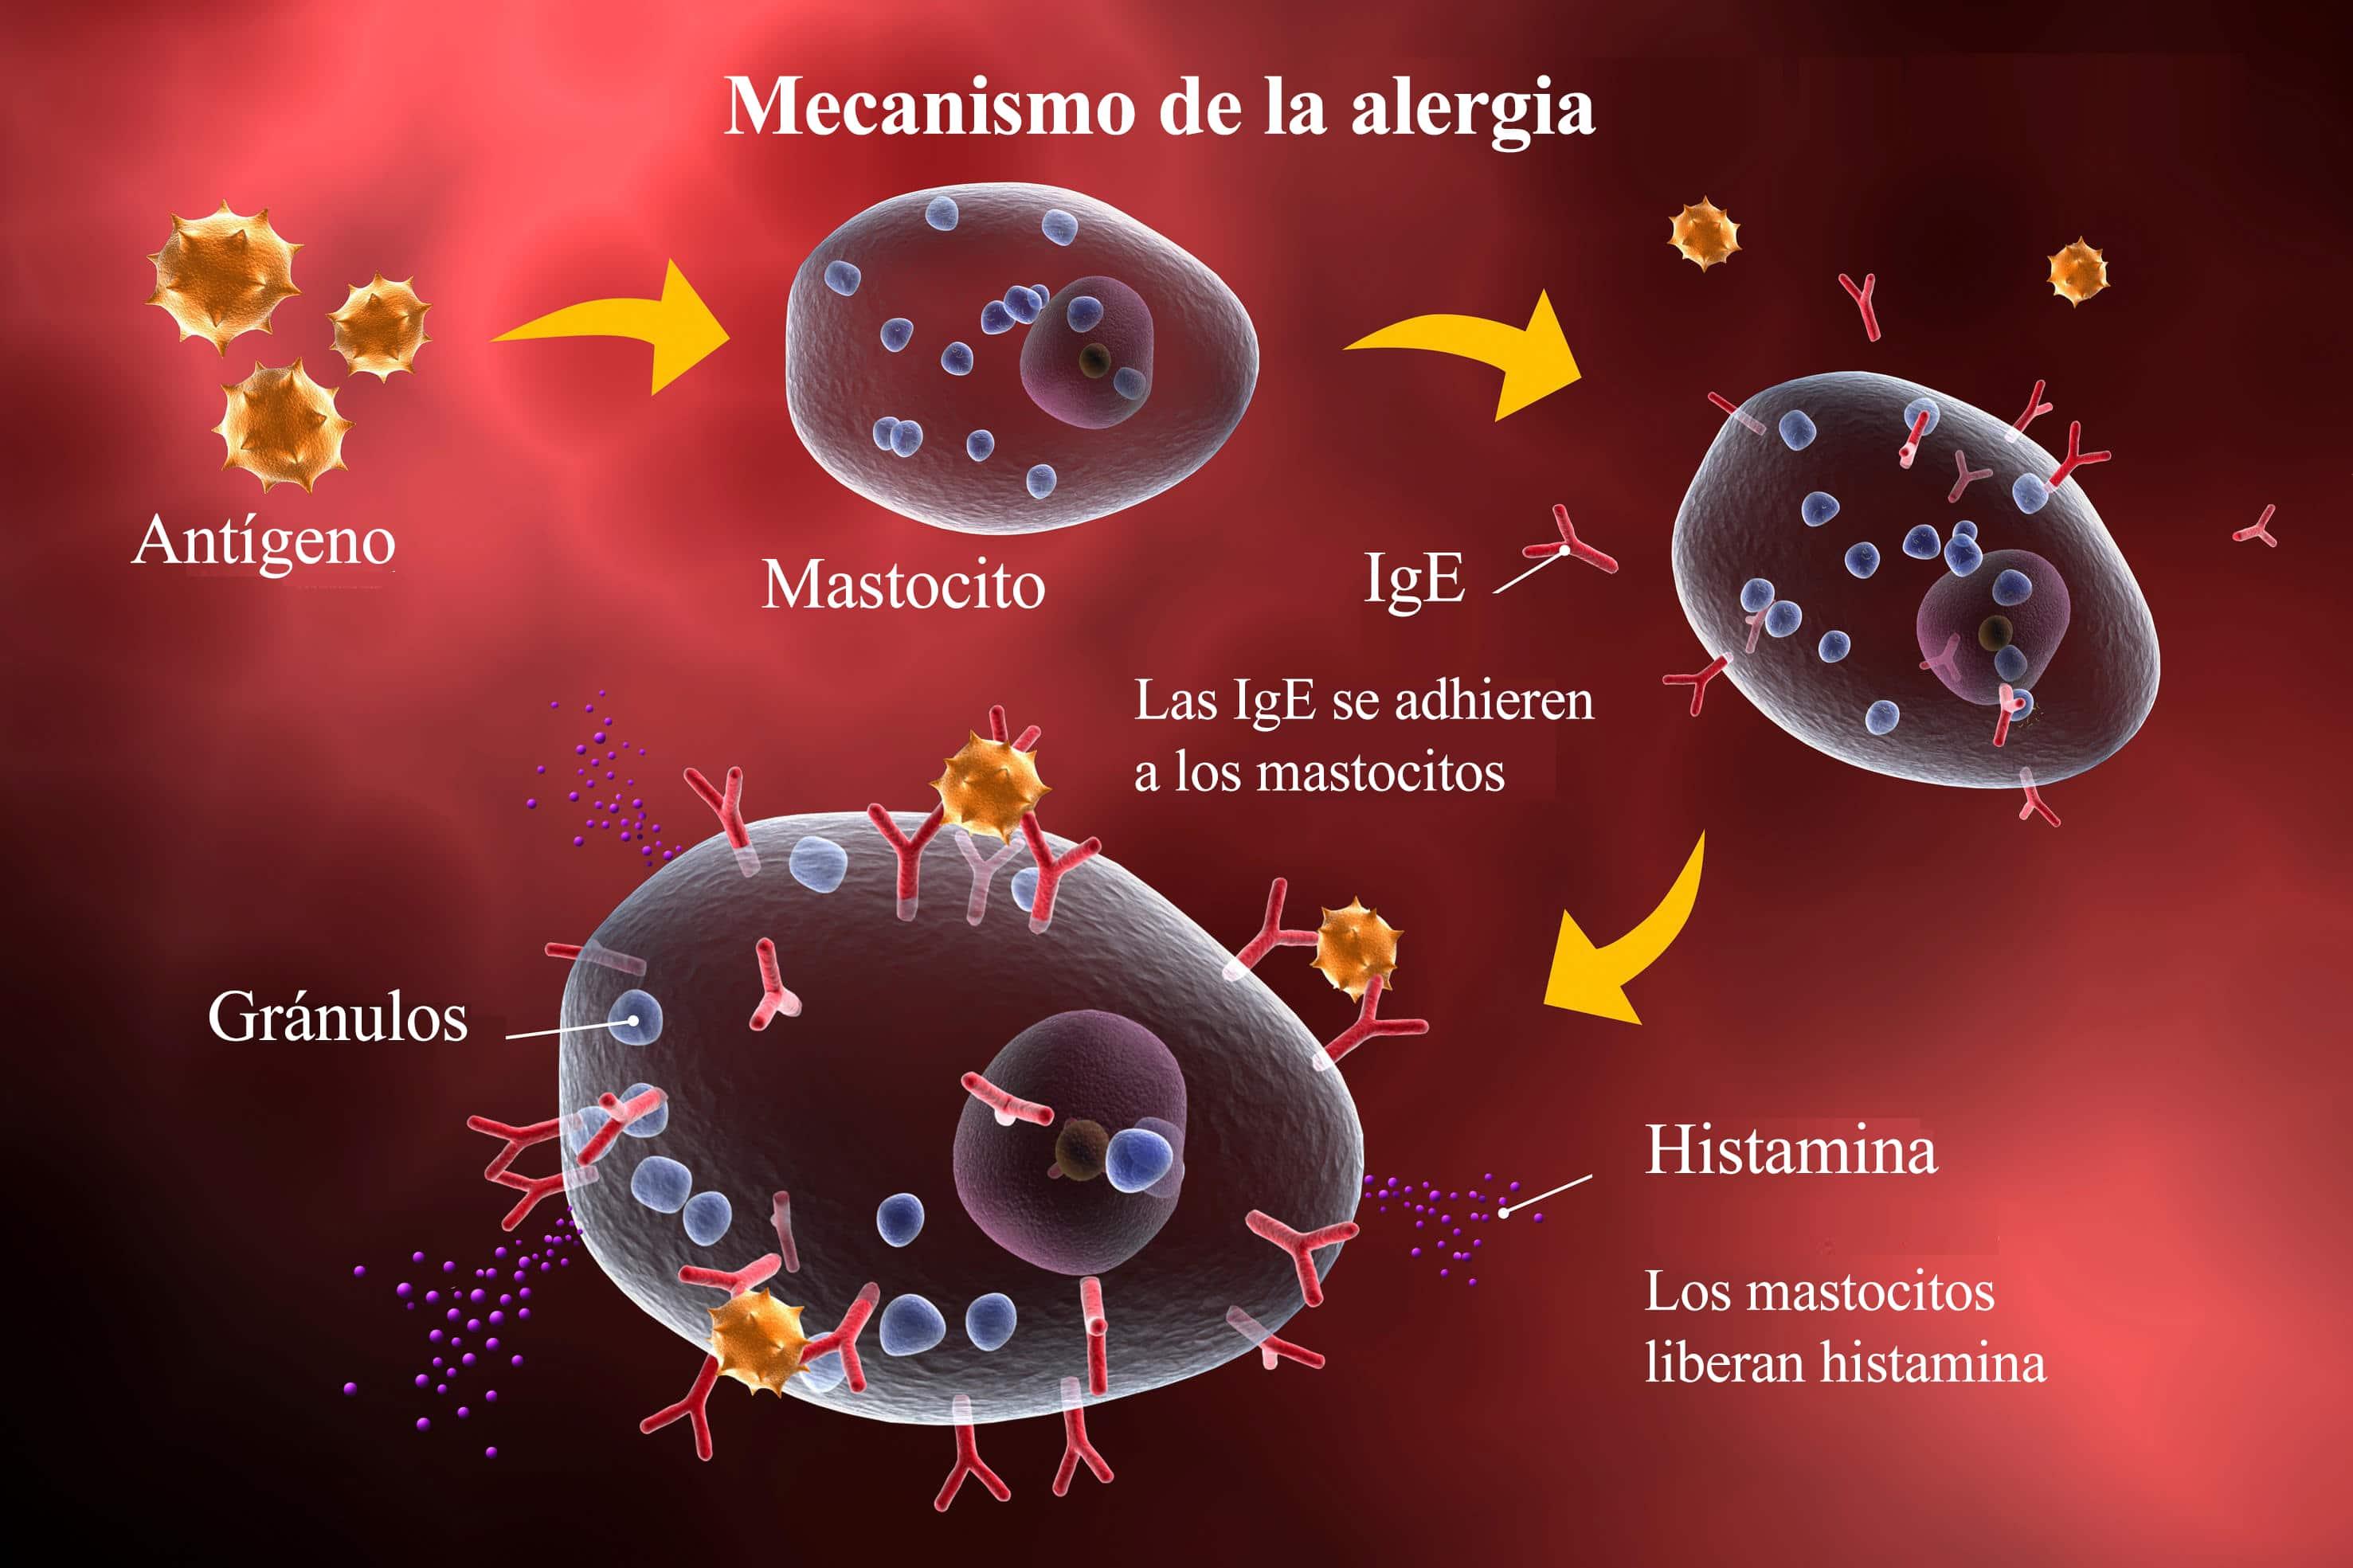 macanismo-de-la-alergia